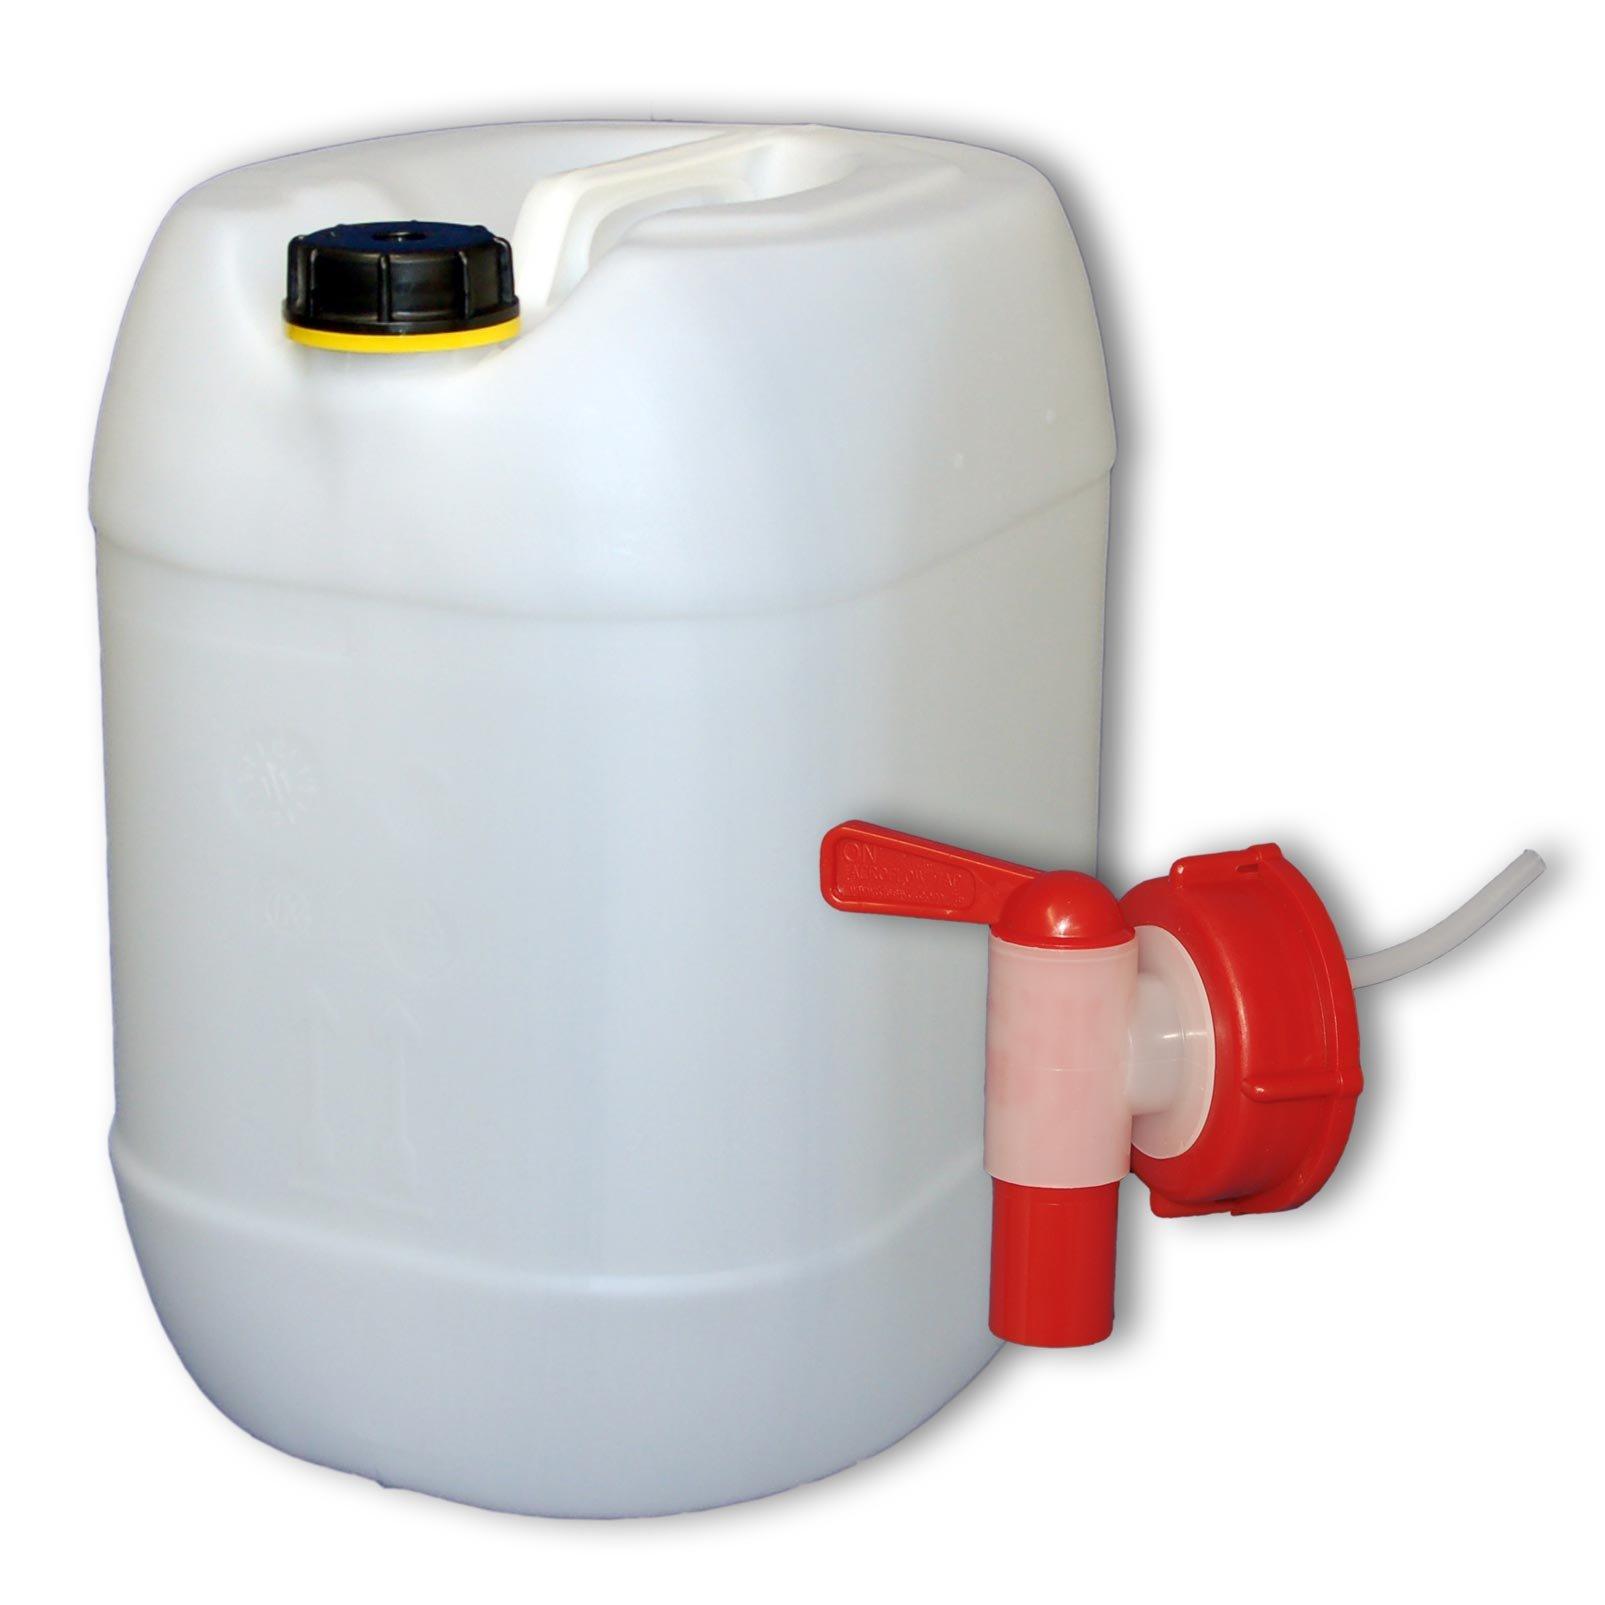 30 L Wasserkanister Mit Hahn, DIN 61 Product Image